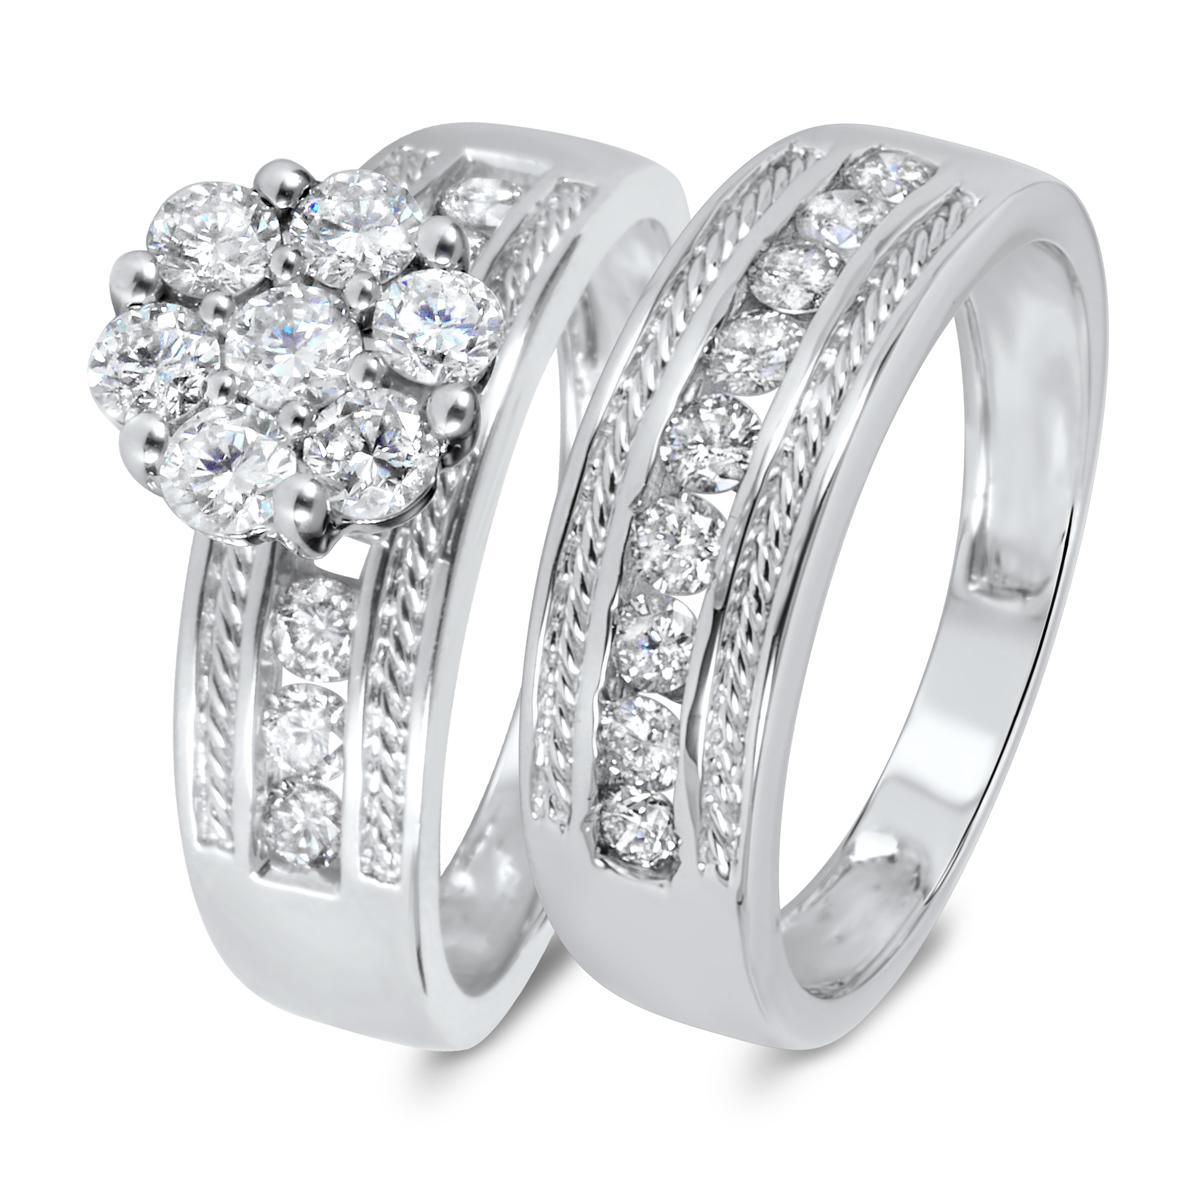 1 1/3 CT. T.W. Diamond Women's Bridal Wedding Ring Set 14K White Gold